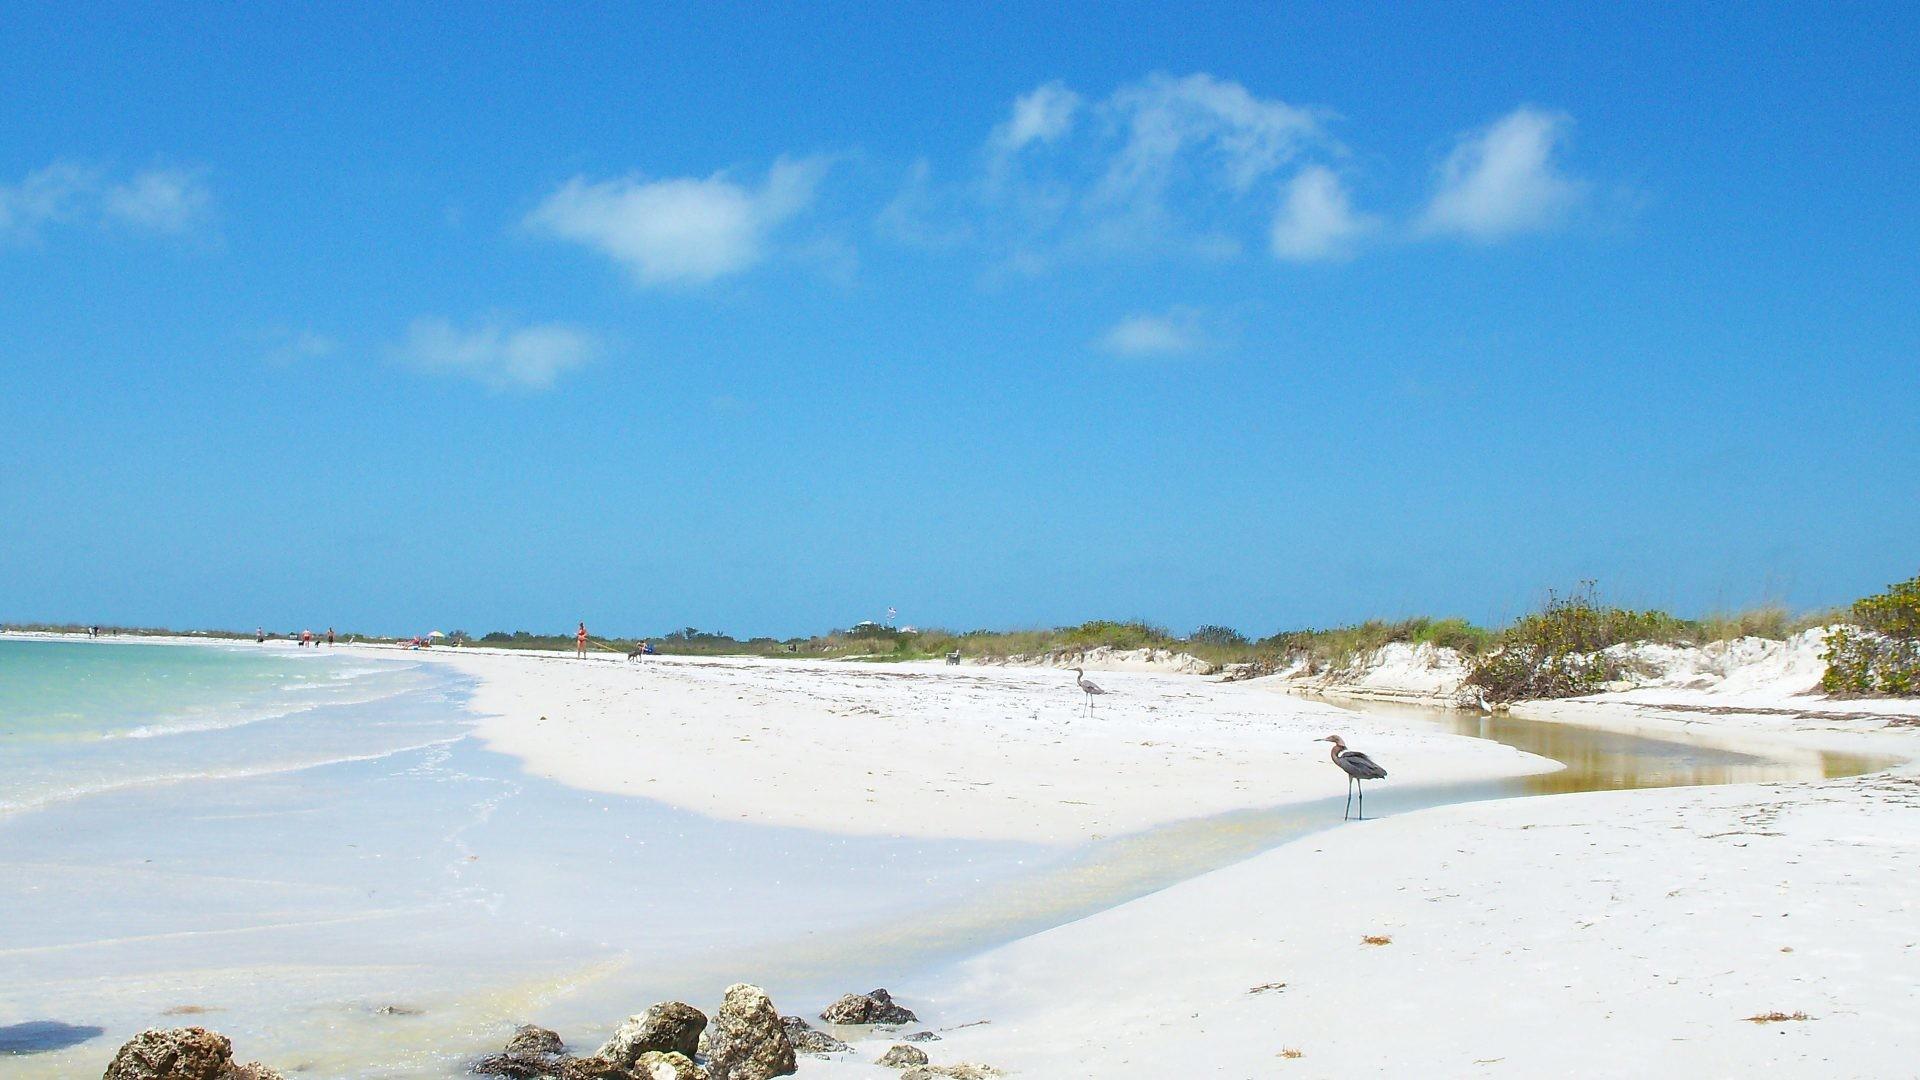 October 5, 2016 – Clouds Dunes Island Nature Honeymoon Sand Sea Foilage  Ocean Florida Birds